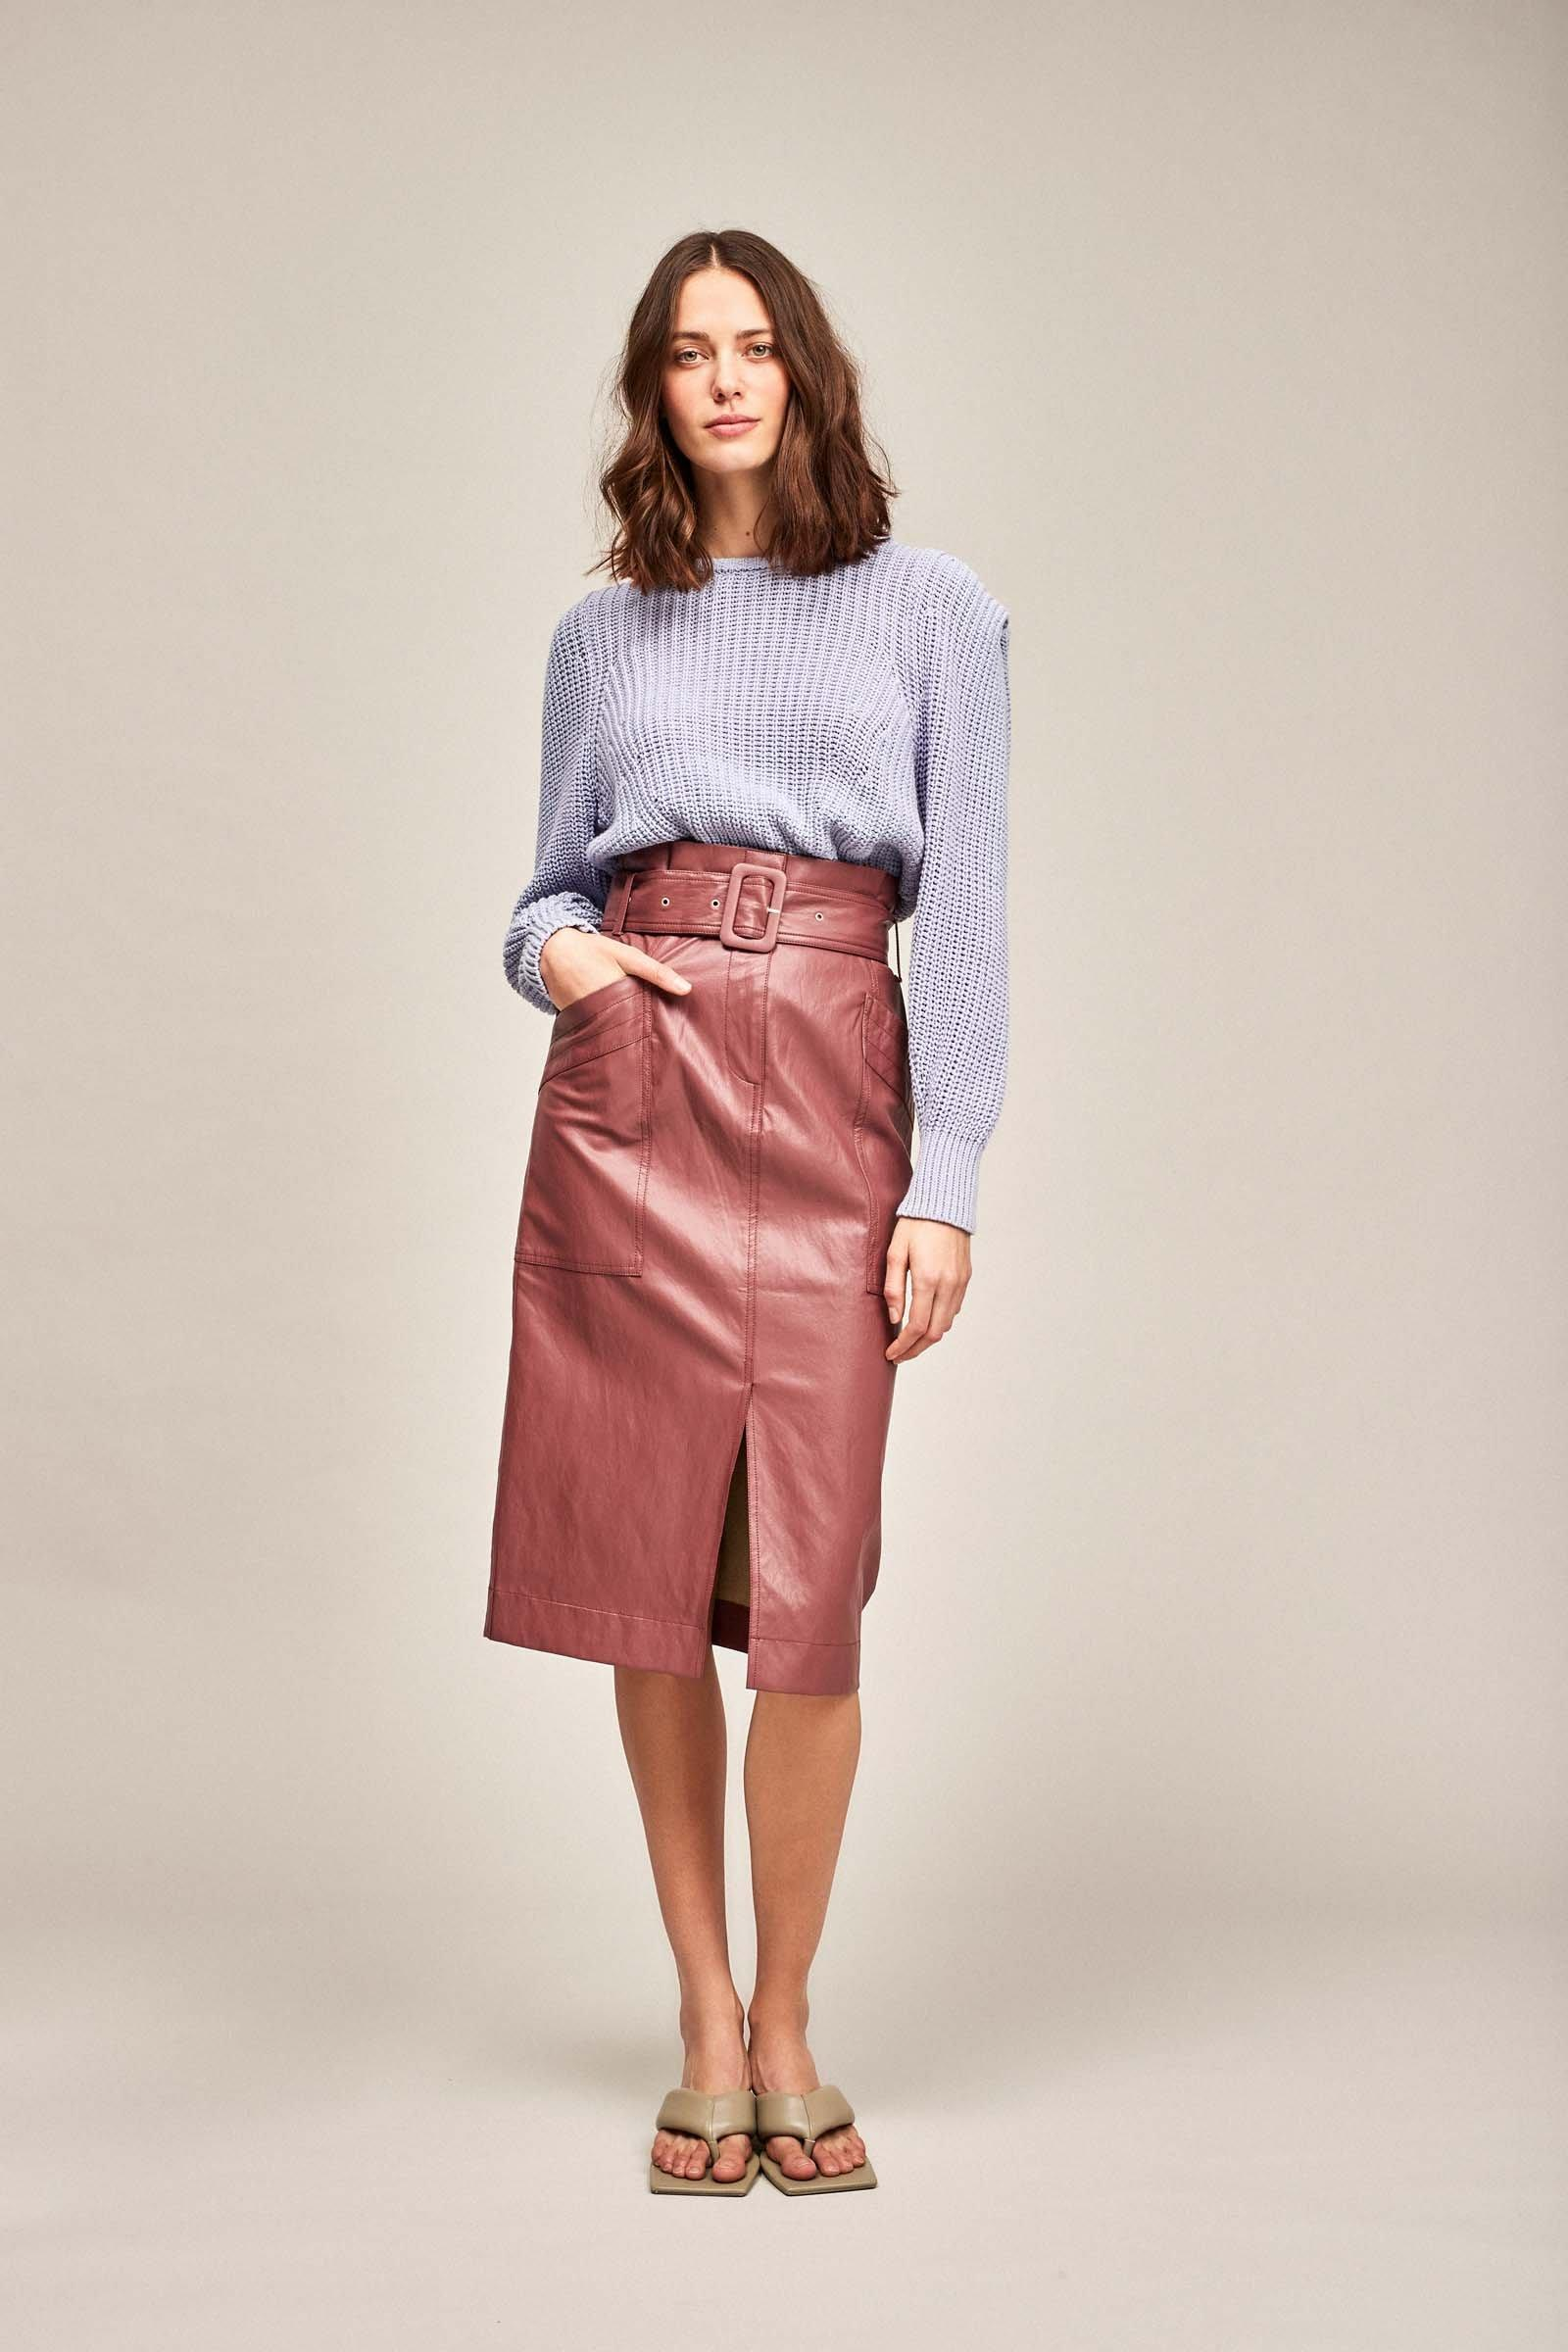 https://webmedia.cks-fashion.com/i/cks/123297ASM_20_h_model